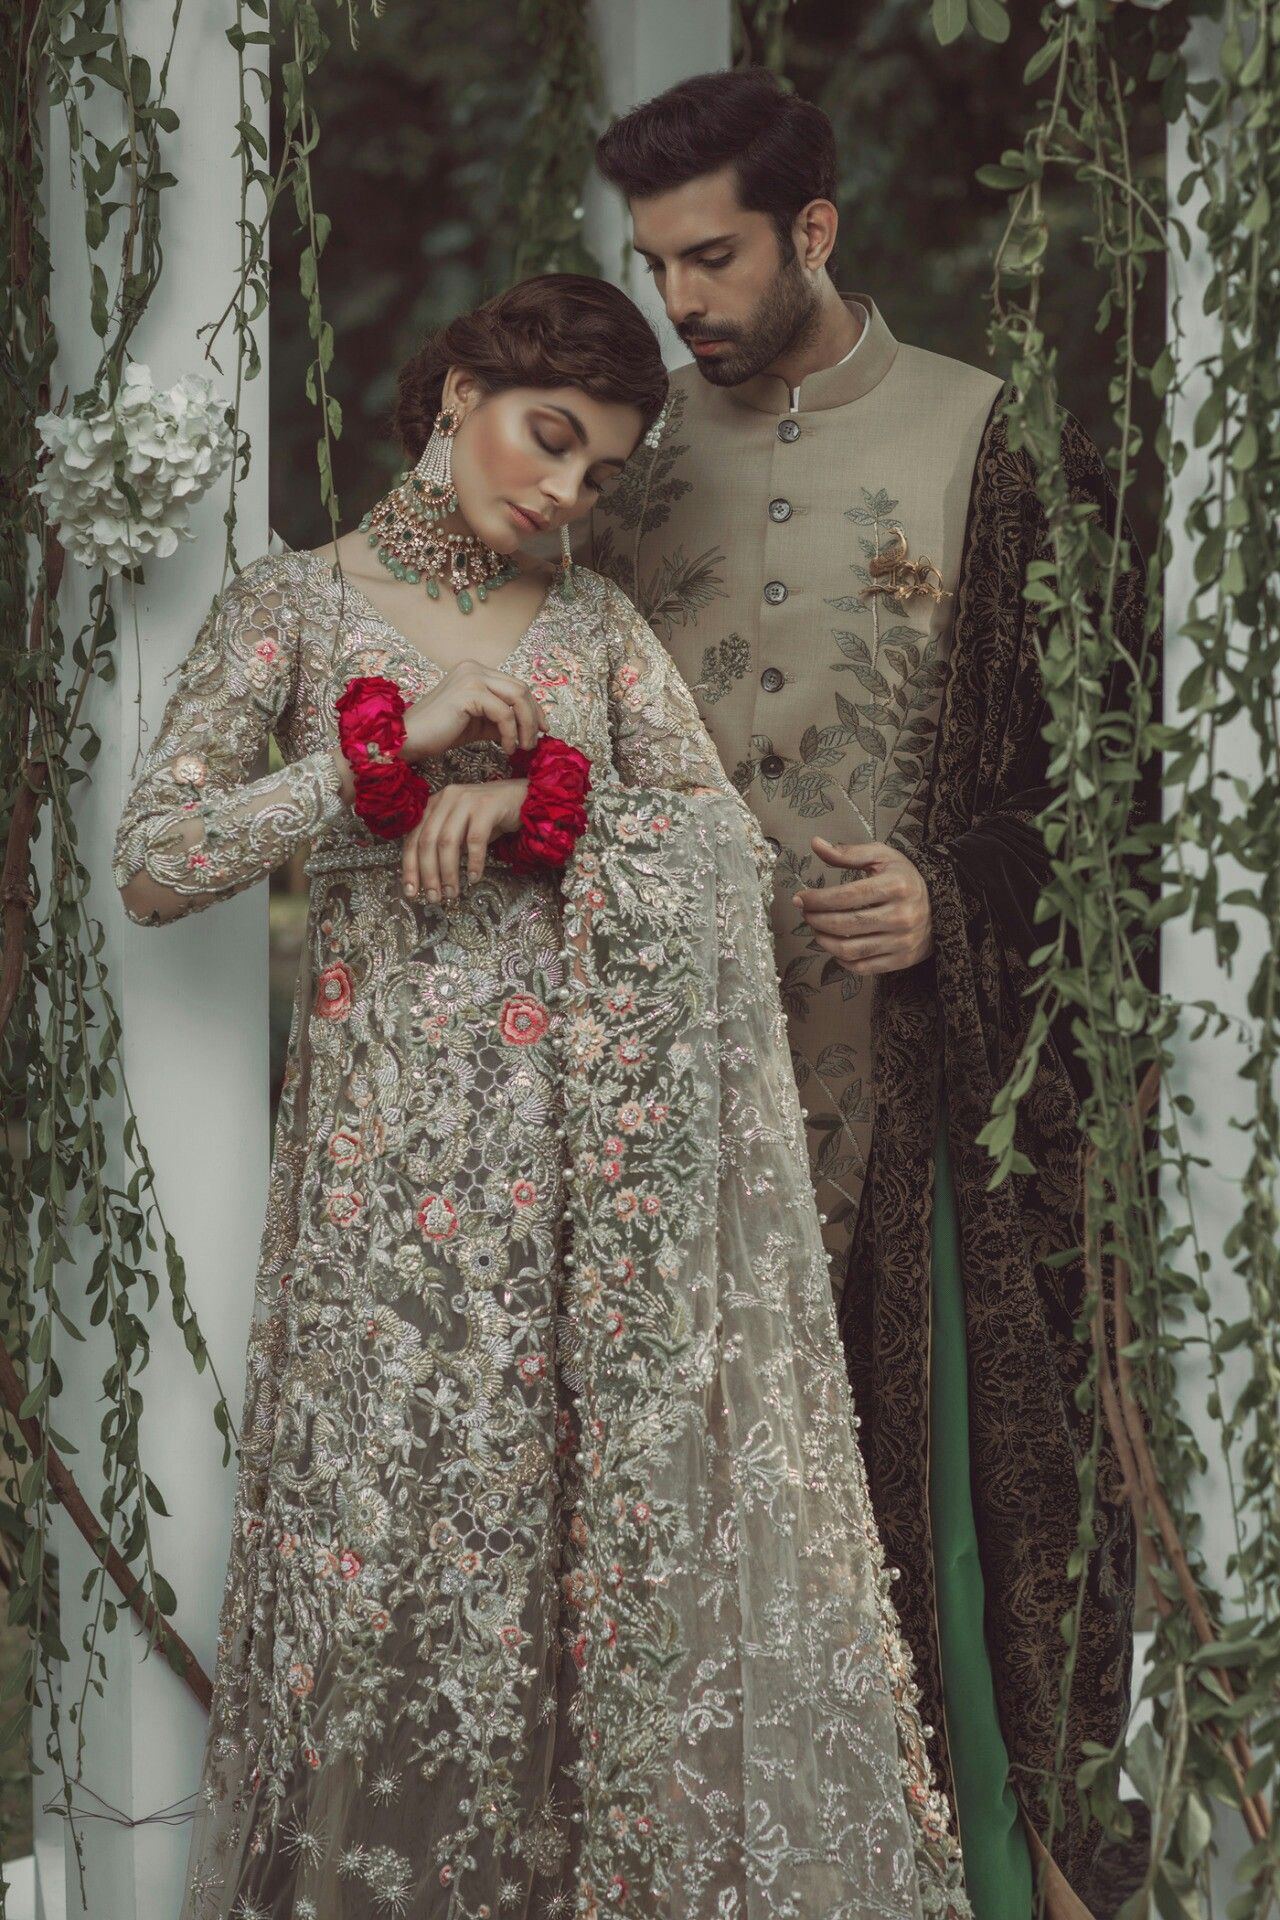 Pin von areejcrafts auf Indian & Pakistani Haute Couture | Pinterest